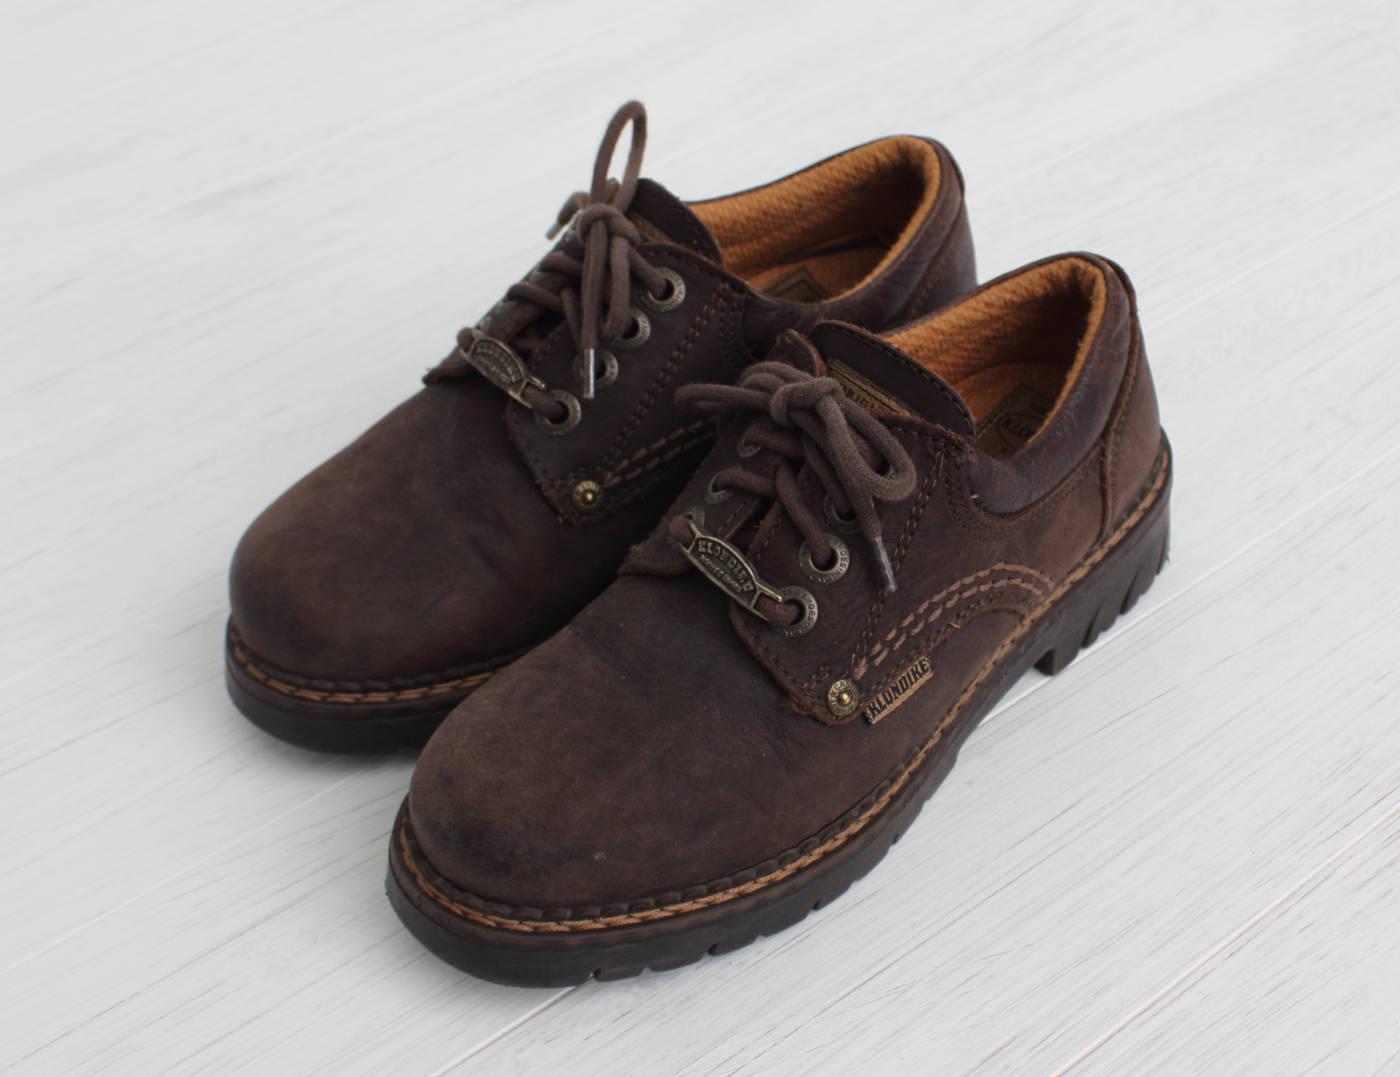 Vintage Brown Suede Shoes/ Size 36